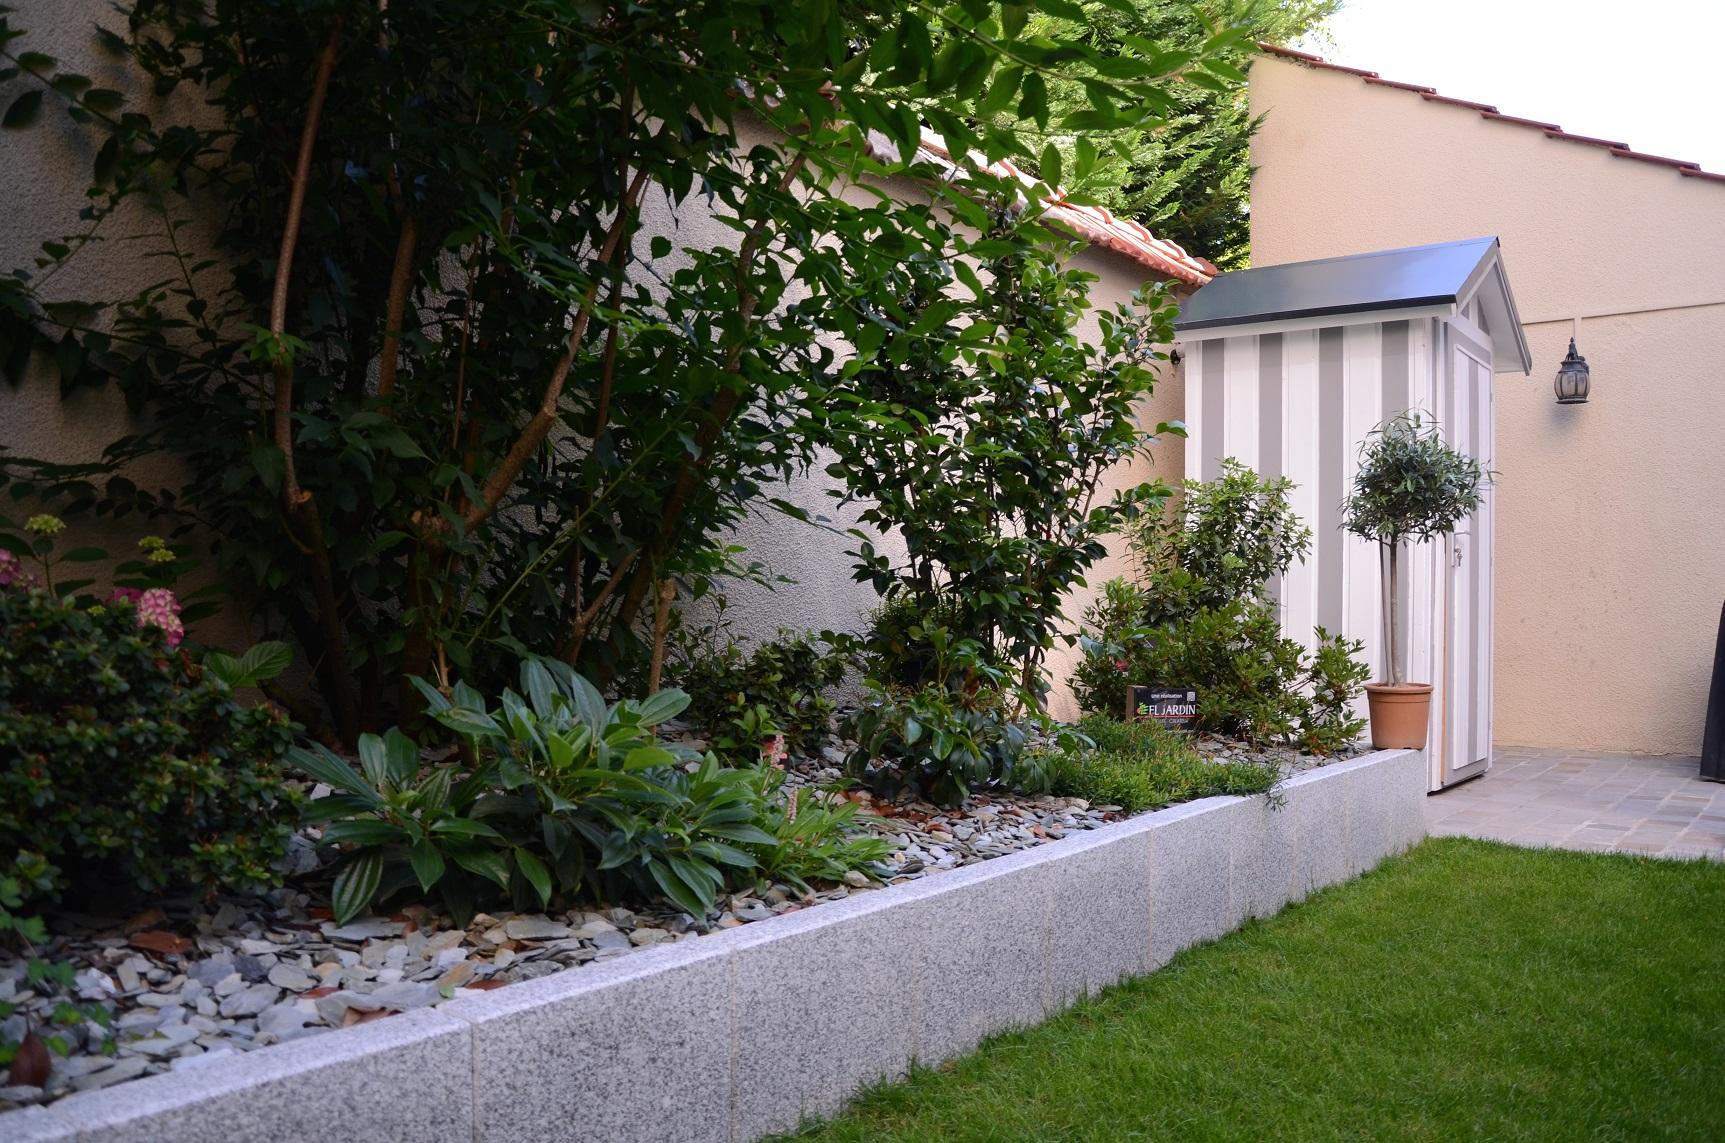 pavage cabane jardin plantation jardiniere fl jardin